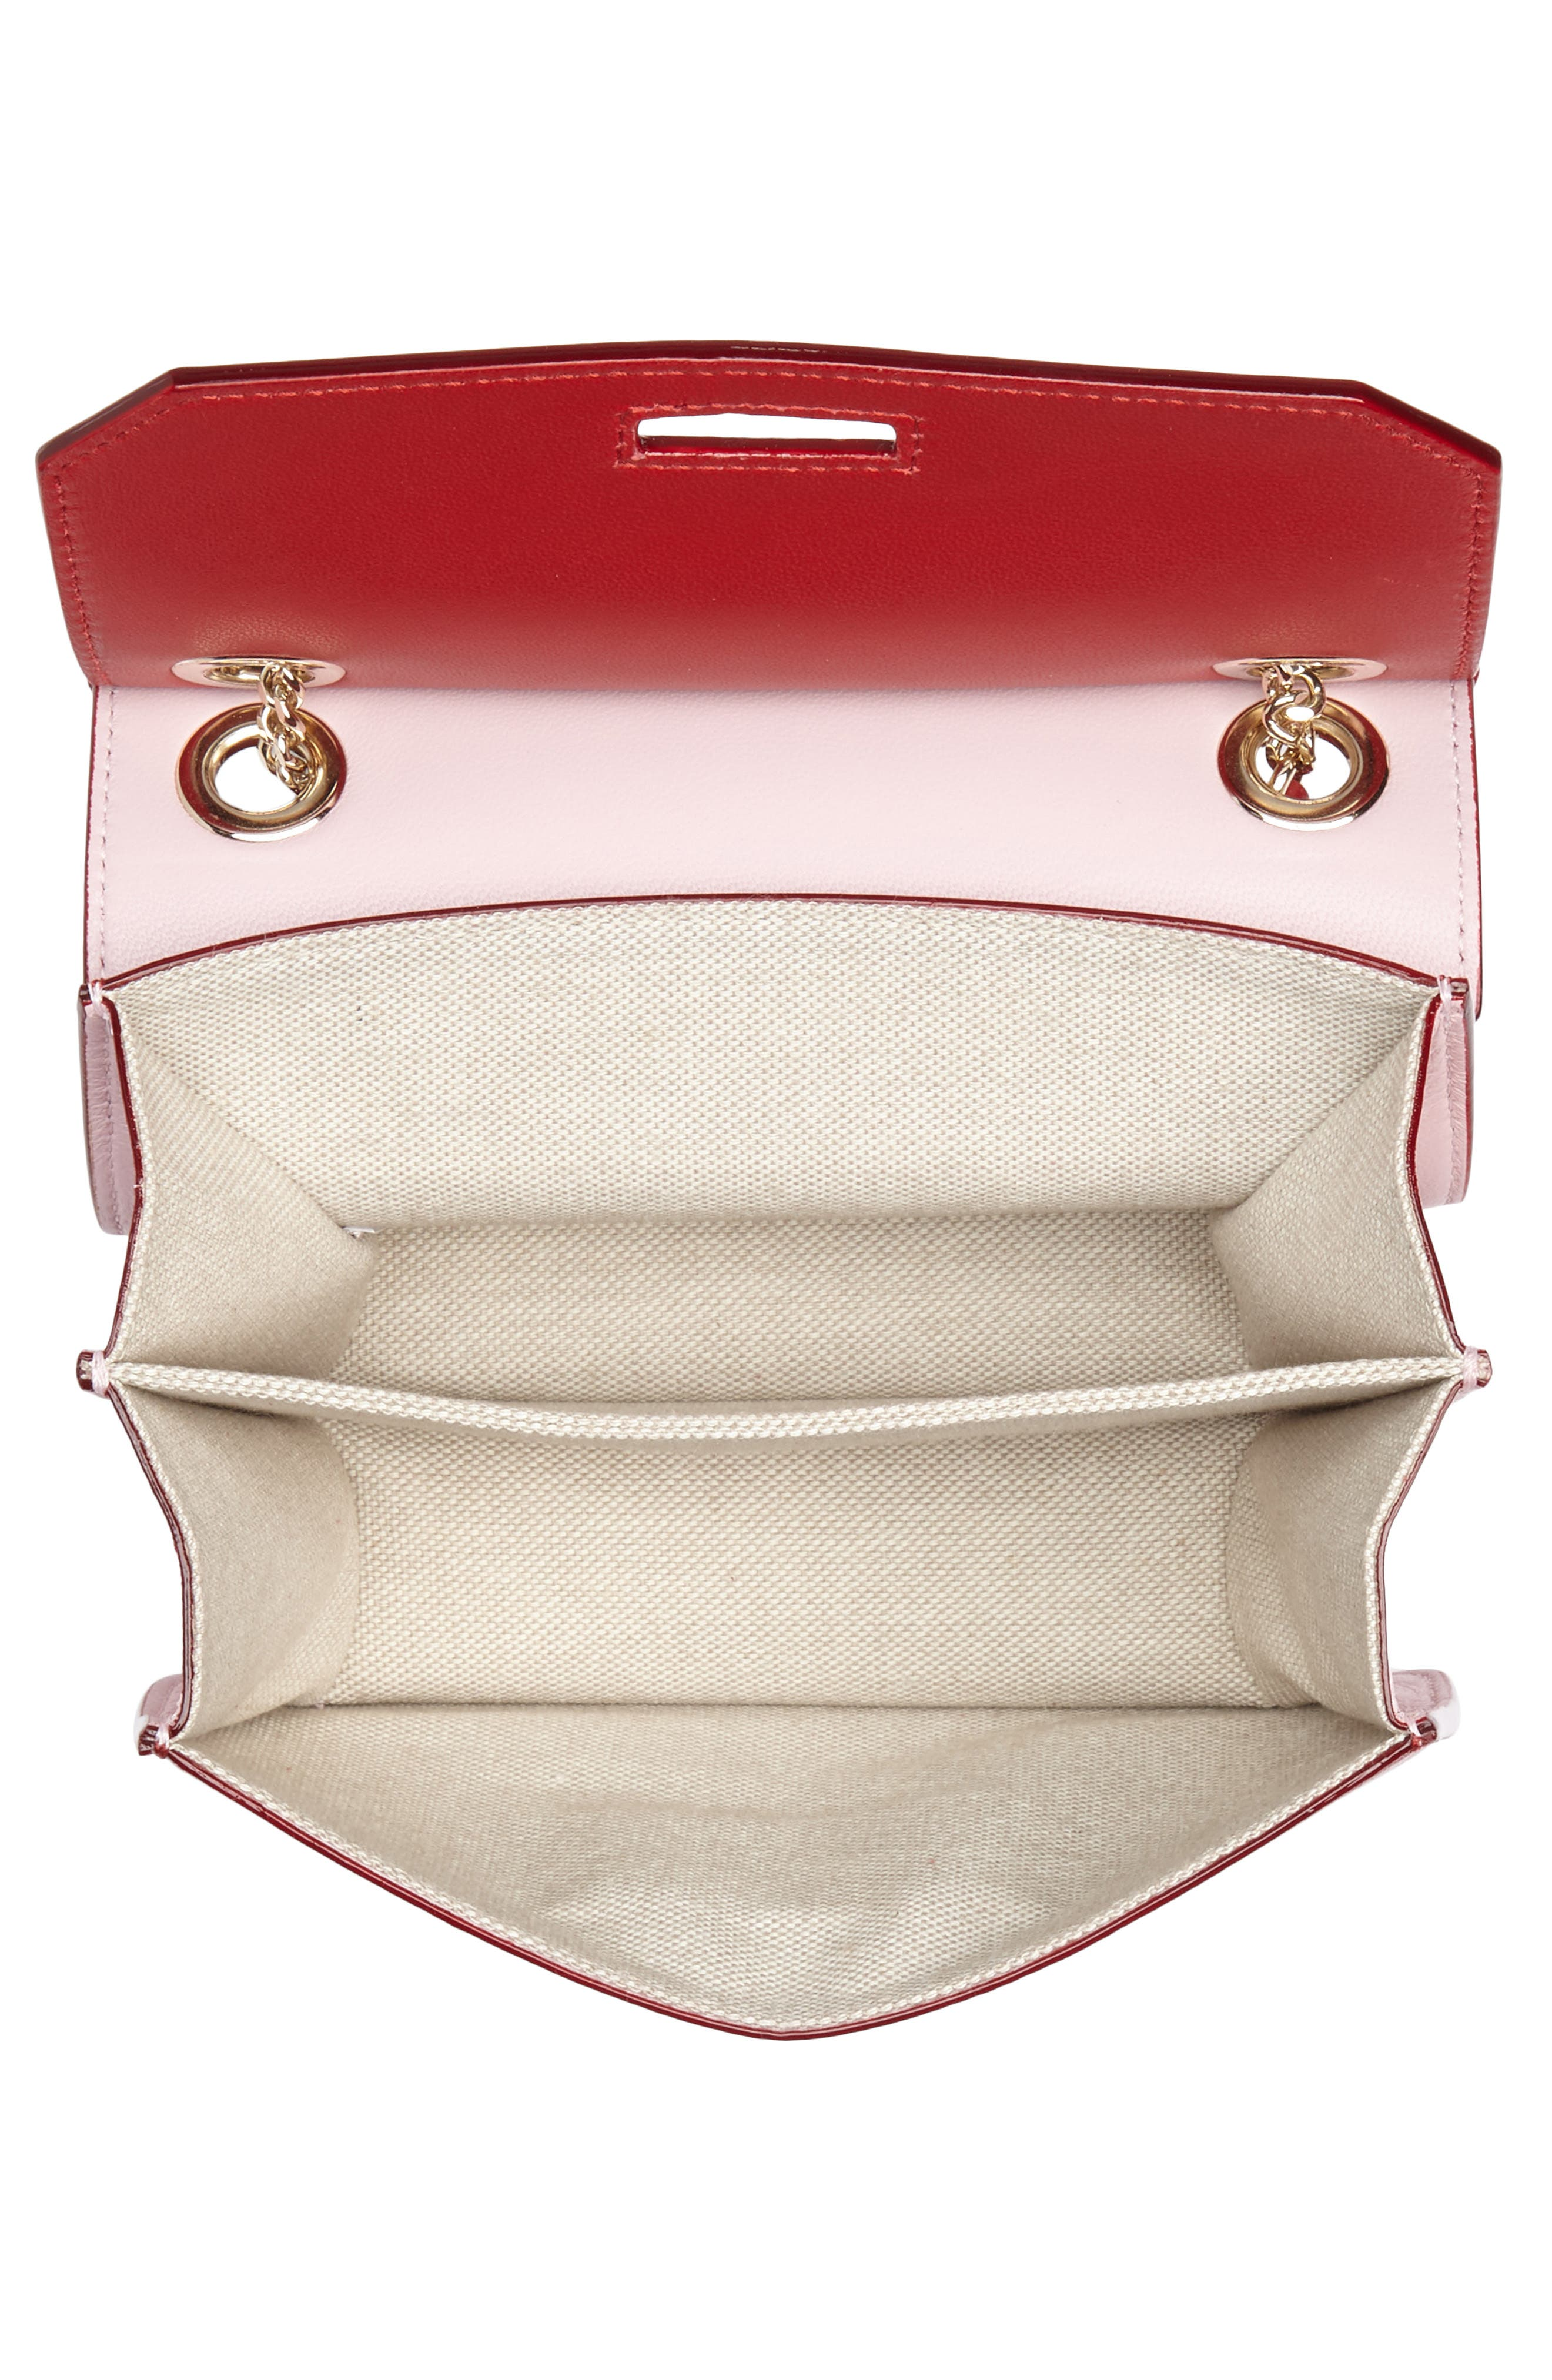 Rebel Mini Colorblock Leather Crossbody Bag,                             Alternate thumbnail 4, color,                             600